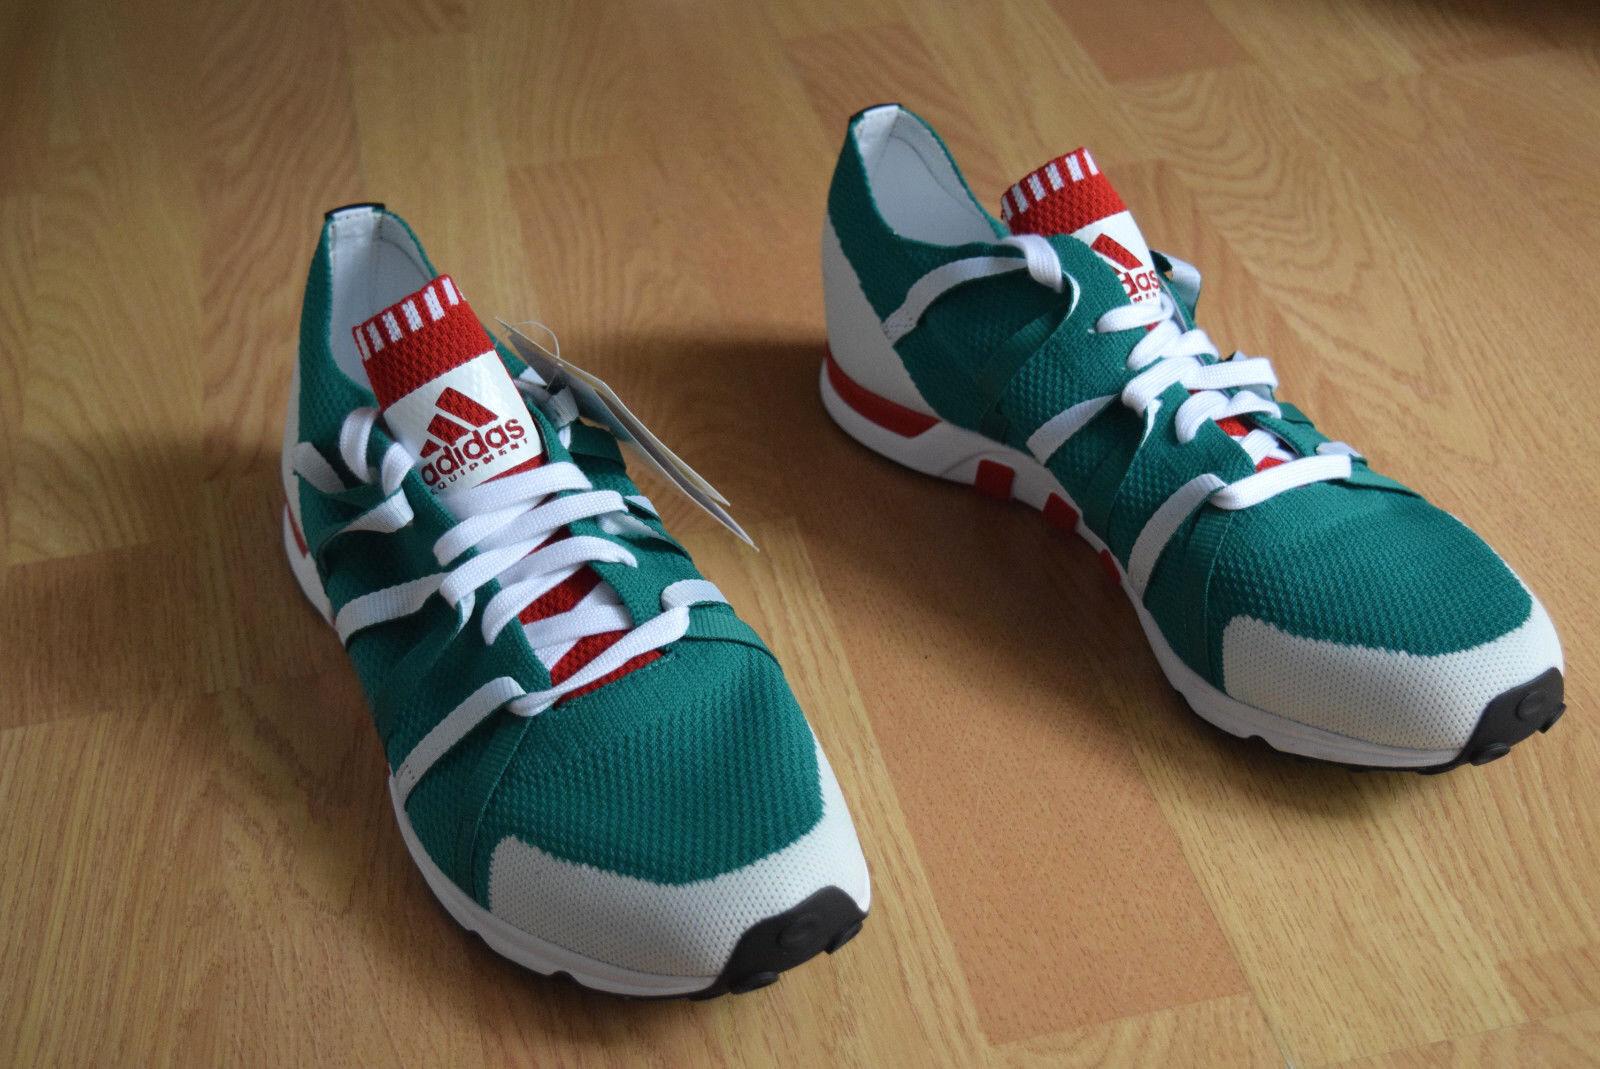 Adidas Equipment Racing 93 PK 38 39 40 41 42 43 44 45 46 47 S79120 cOnSorTium